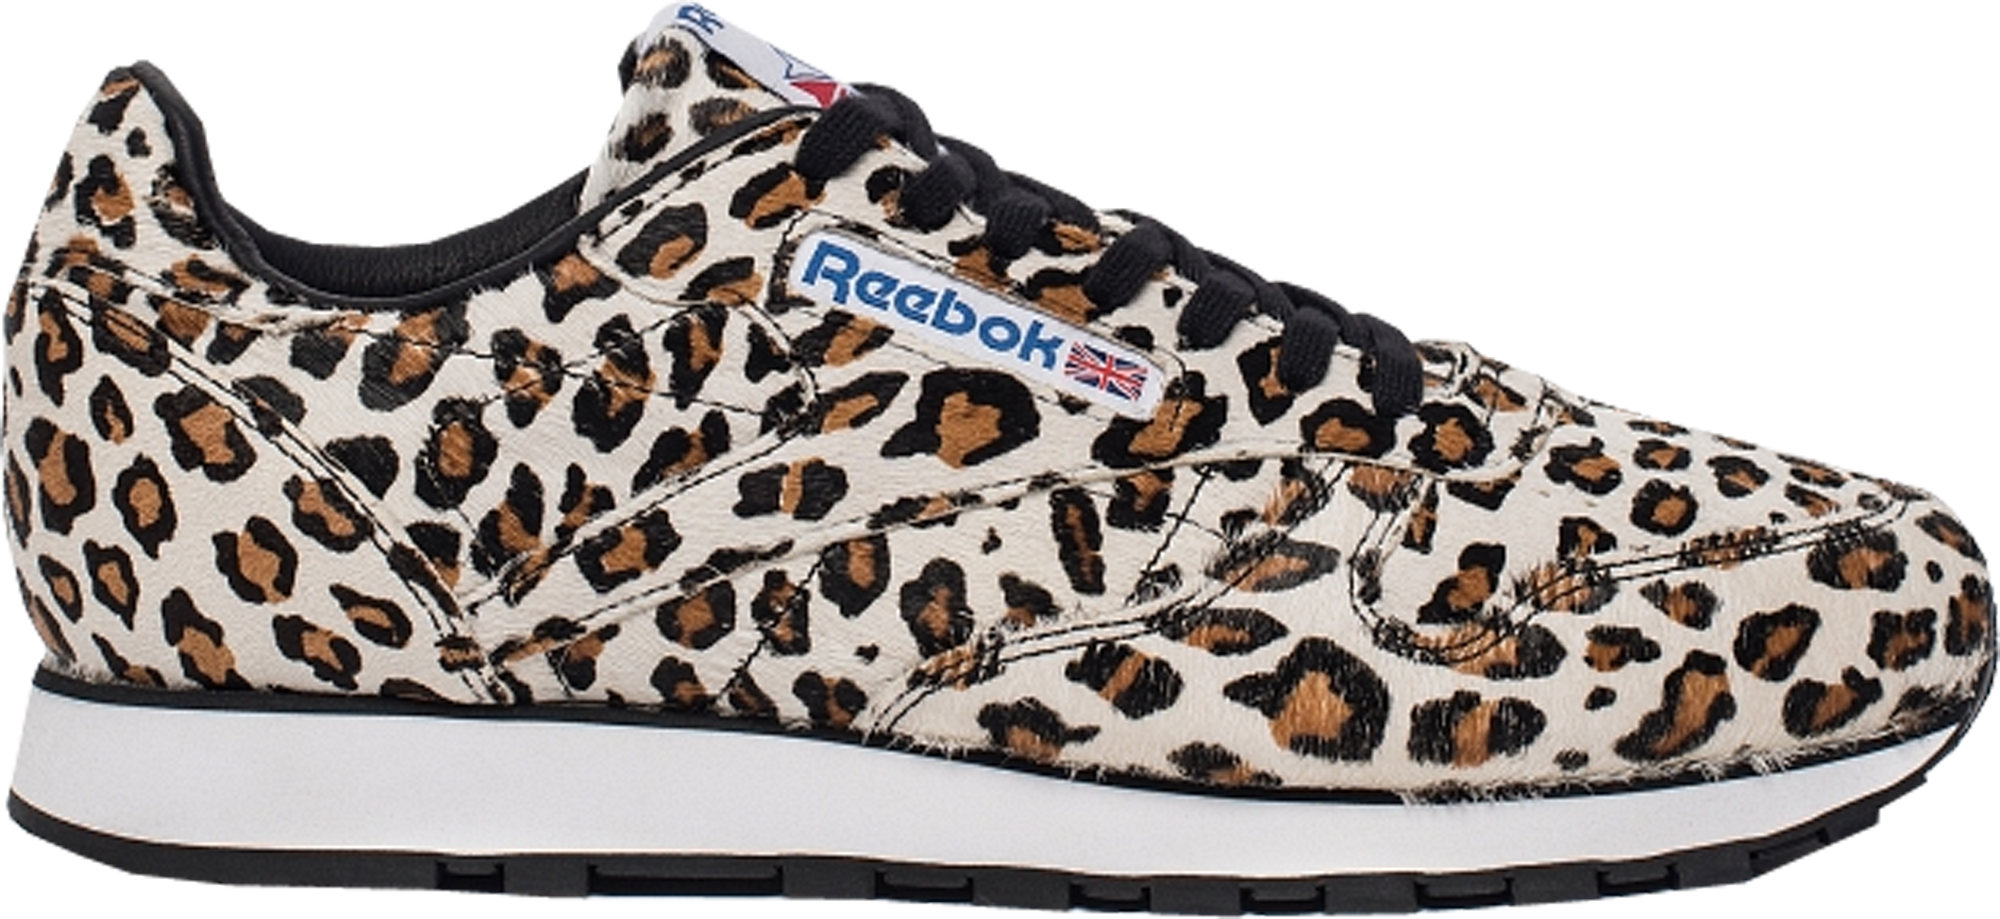 Reebok Classic Leather Head Porter Leopard